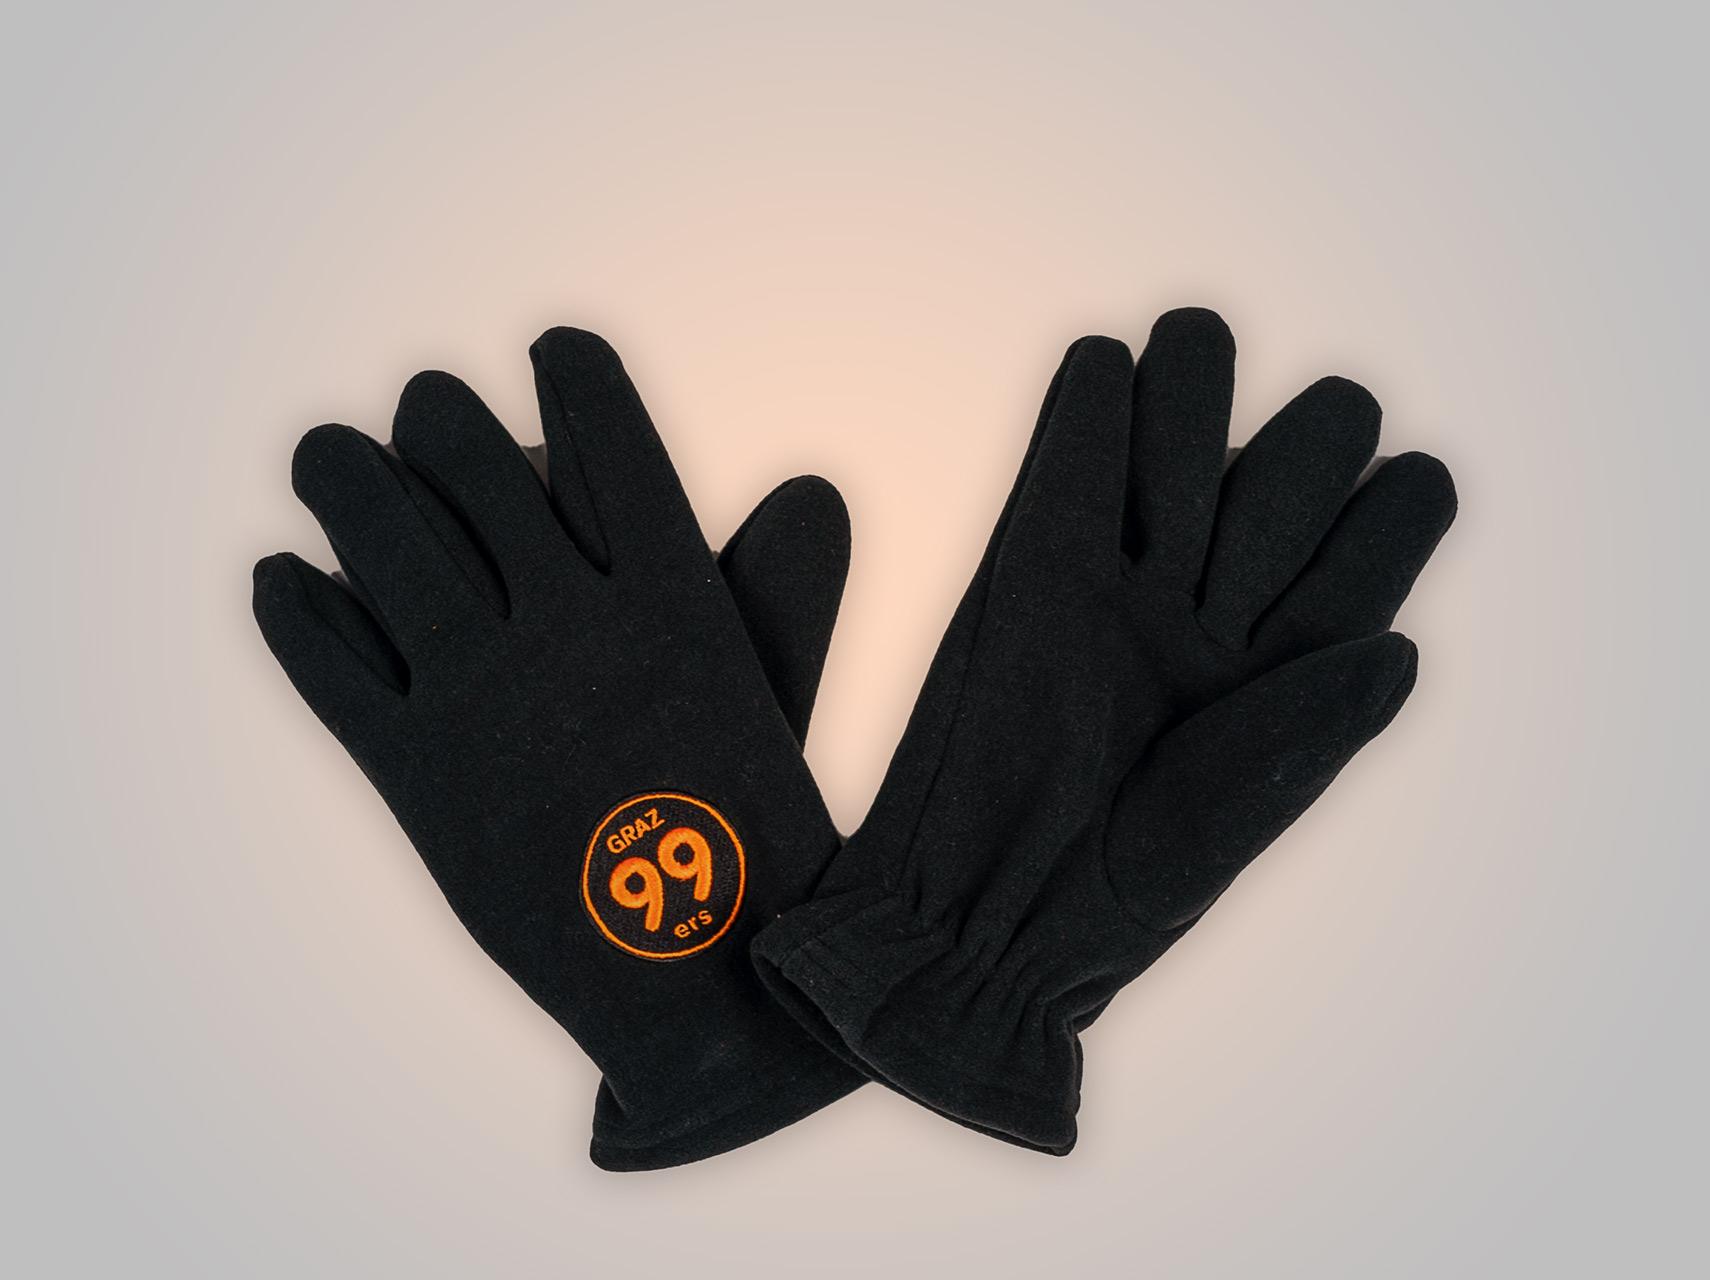 Graz99ers Onlineshop - Handschuhe